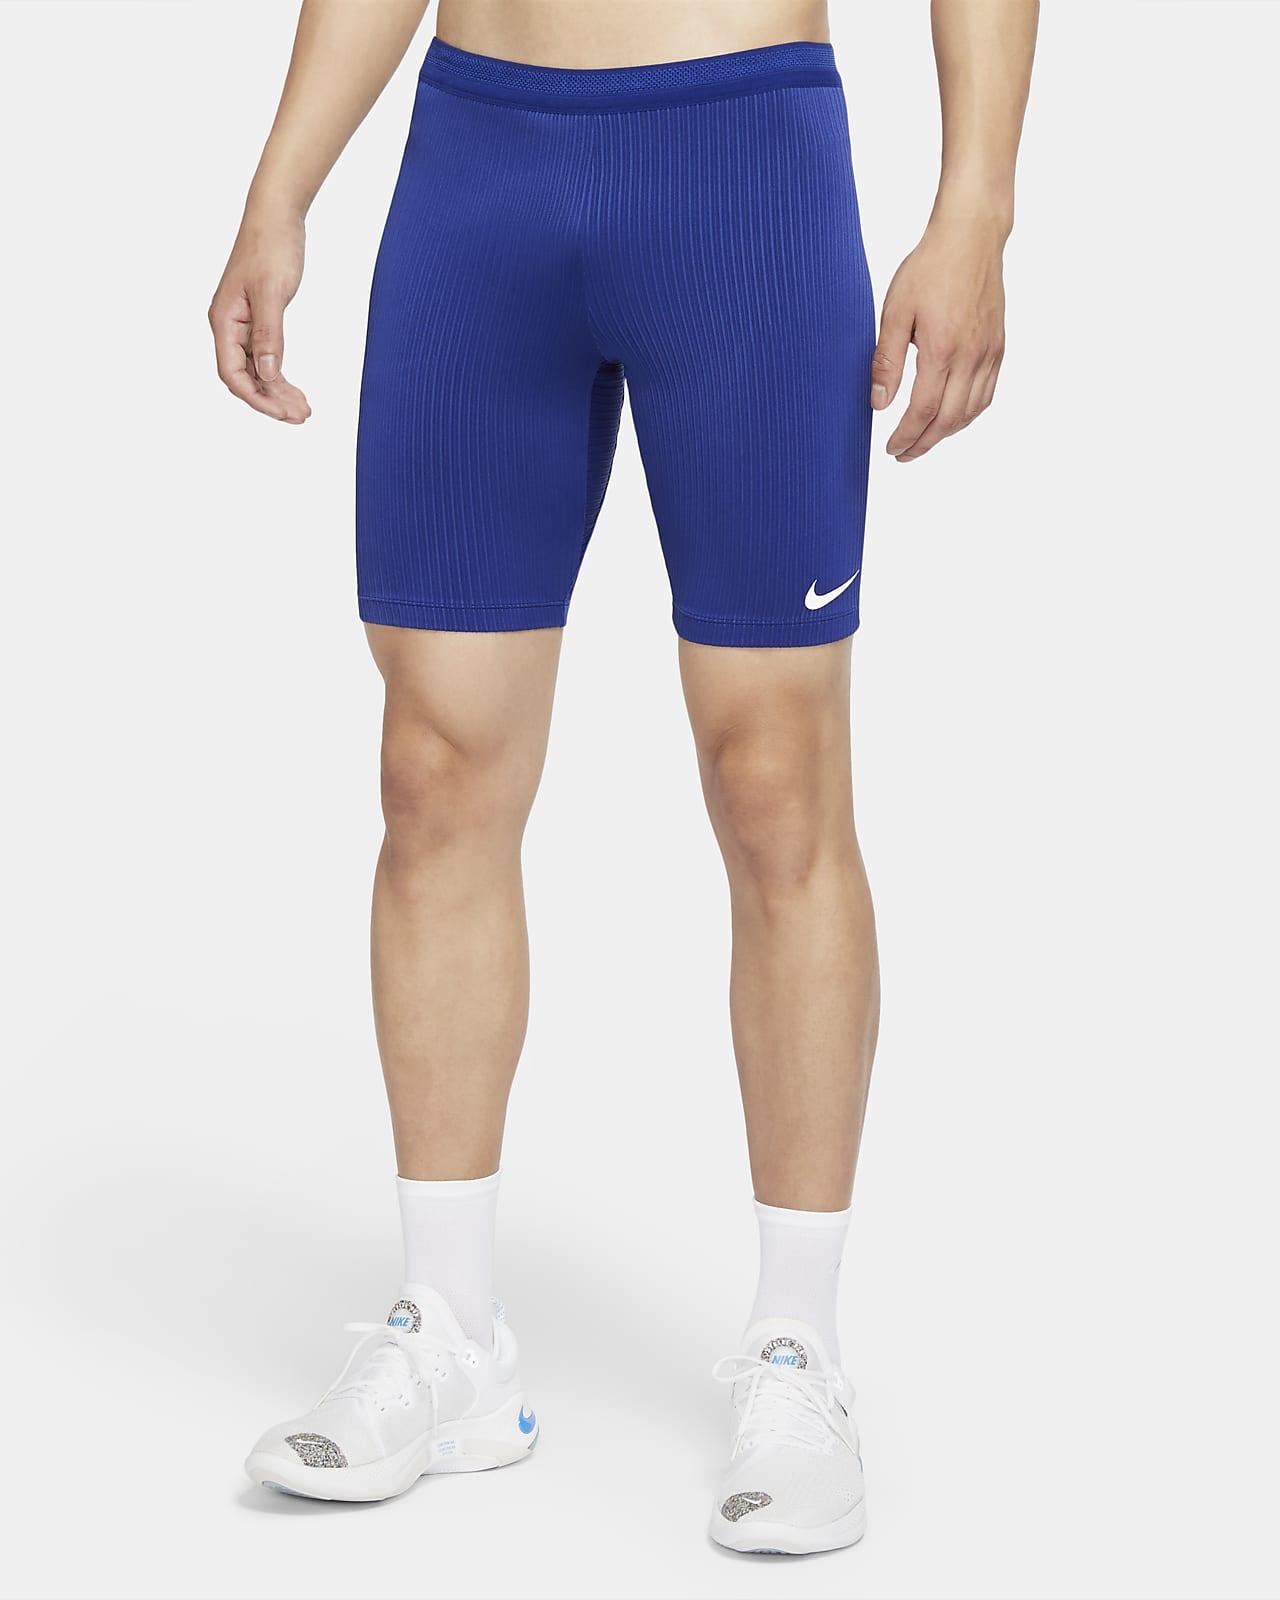 Nike Dri-FIT ADV Team USA AeroSwift Halblange Wettkampf-Lauftights für Herren